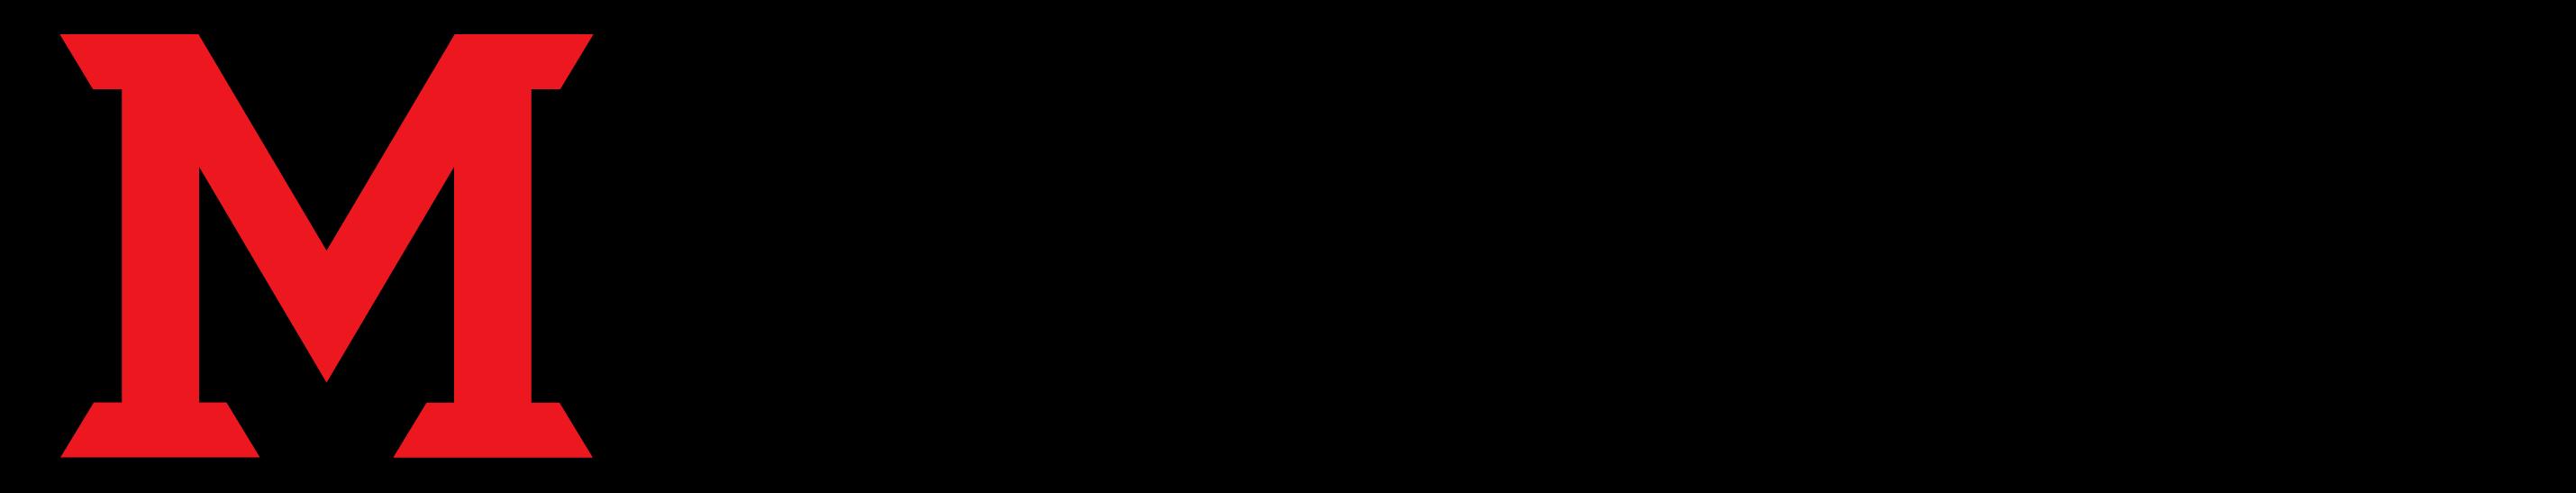 Miami University Logo png